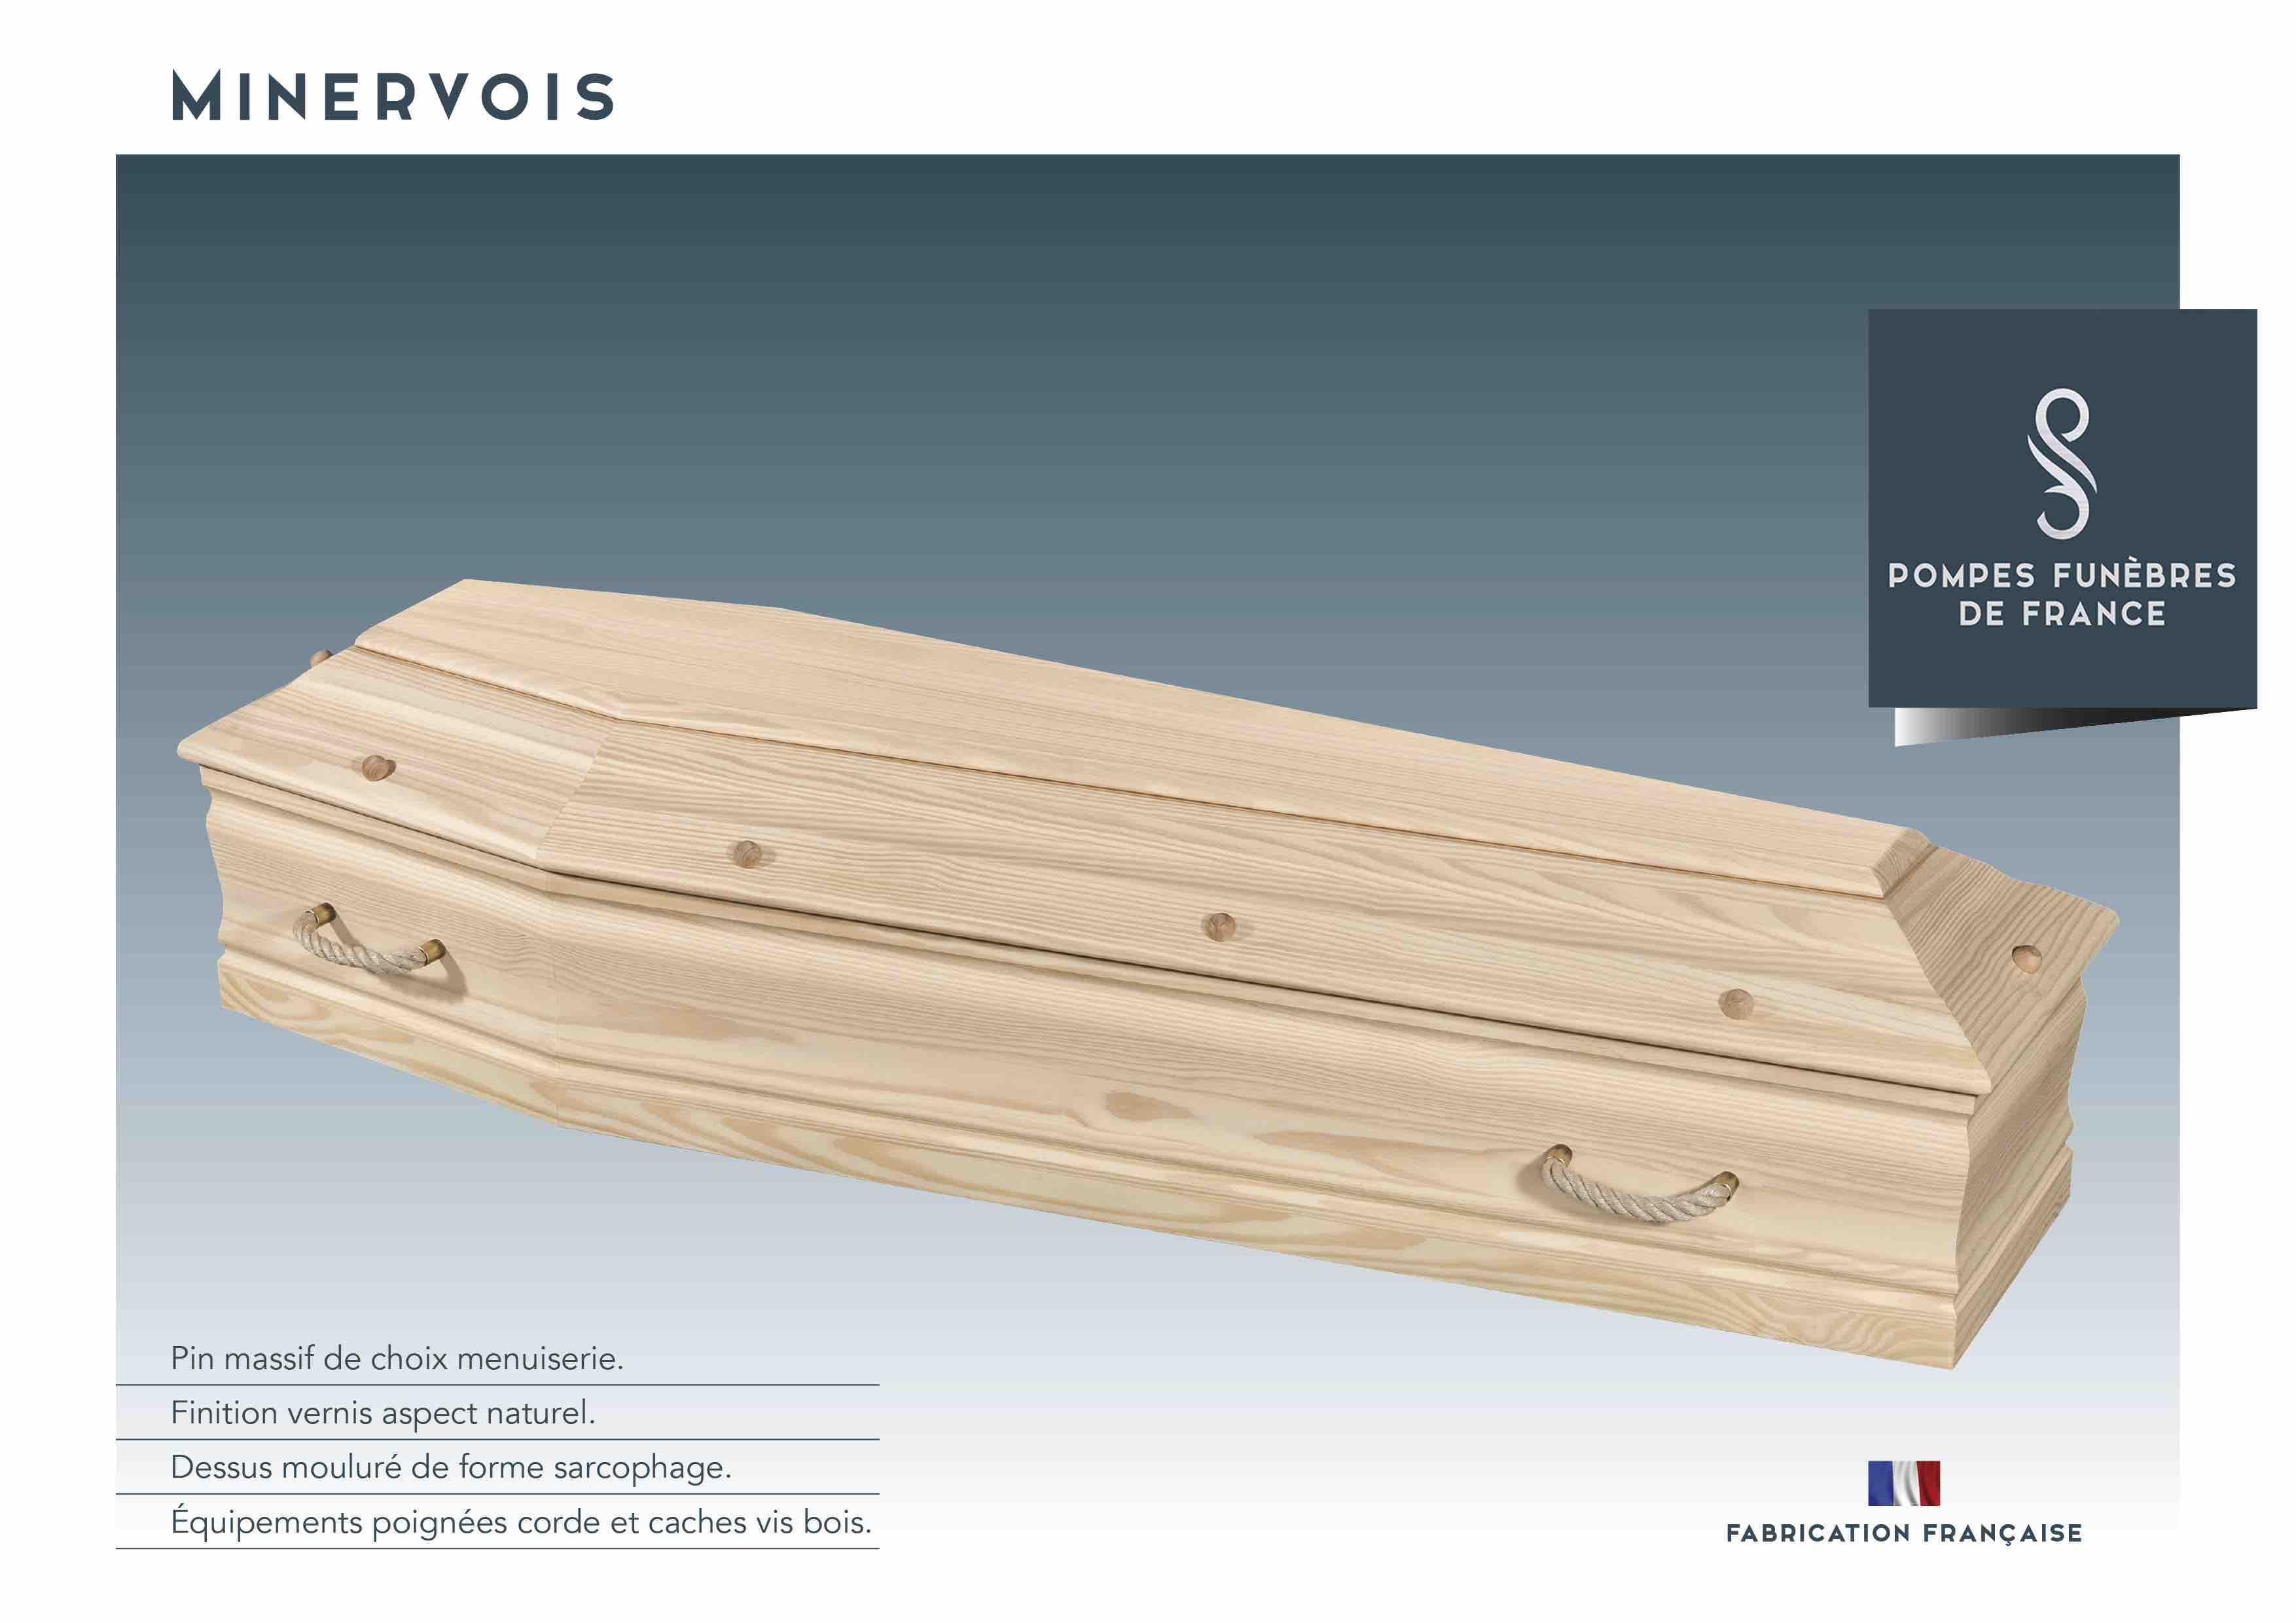 Cercueil Minervois